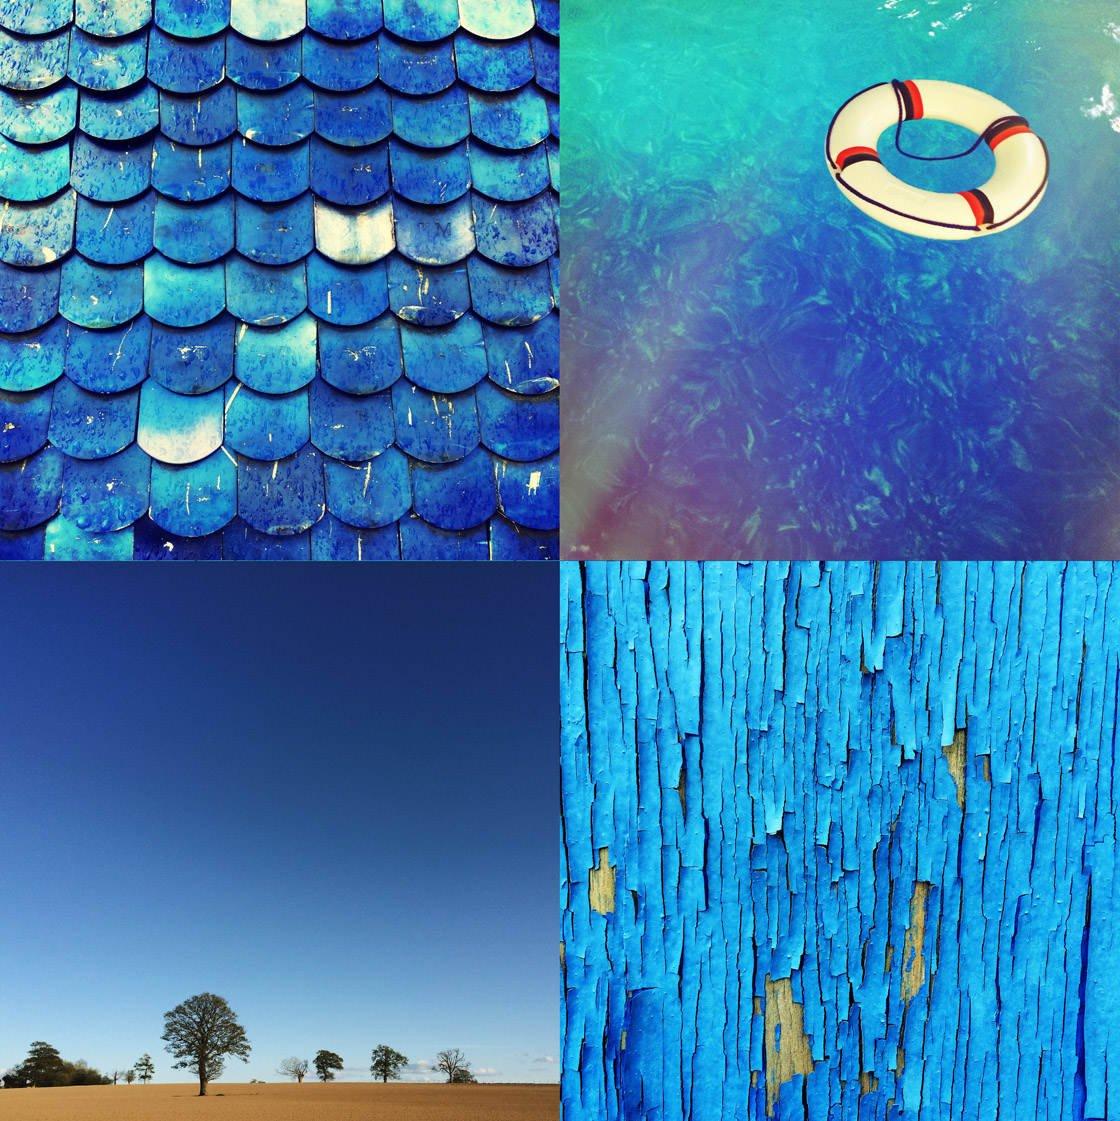 Blue iPhone Photo Collage 2 no script